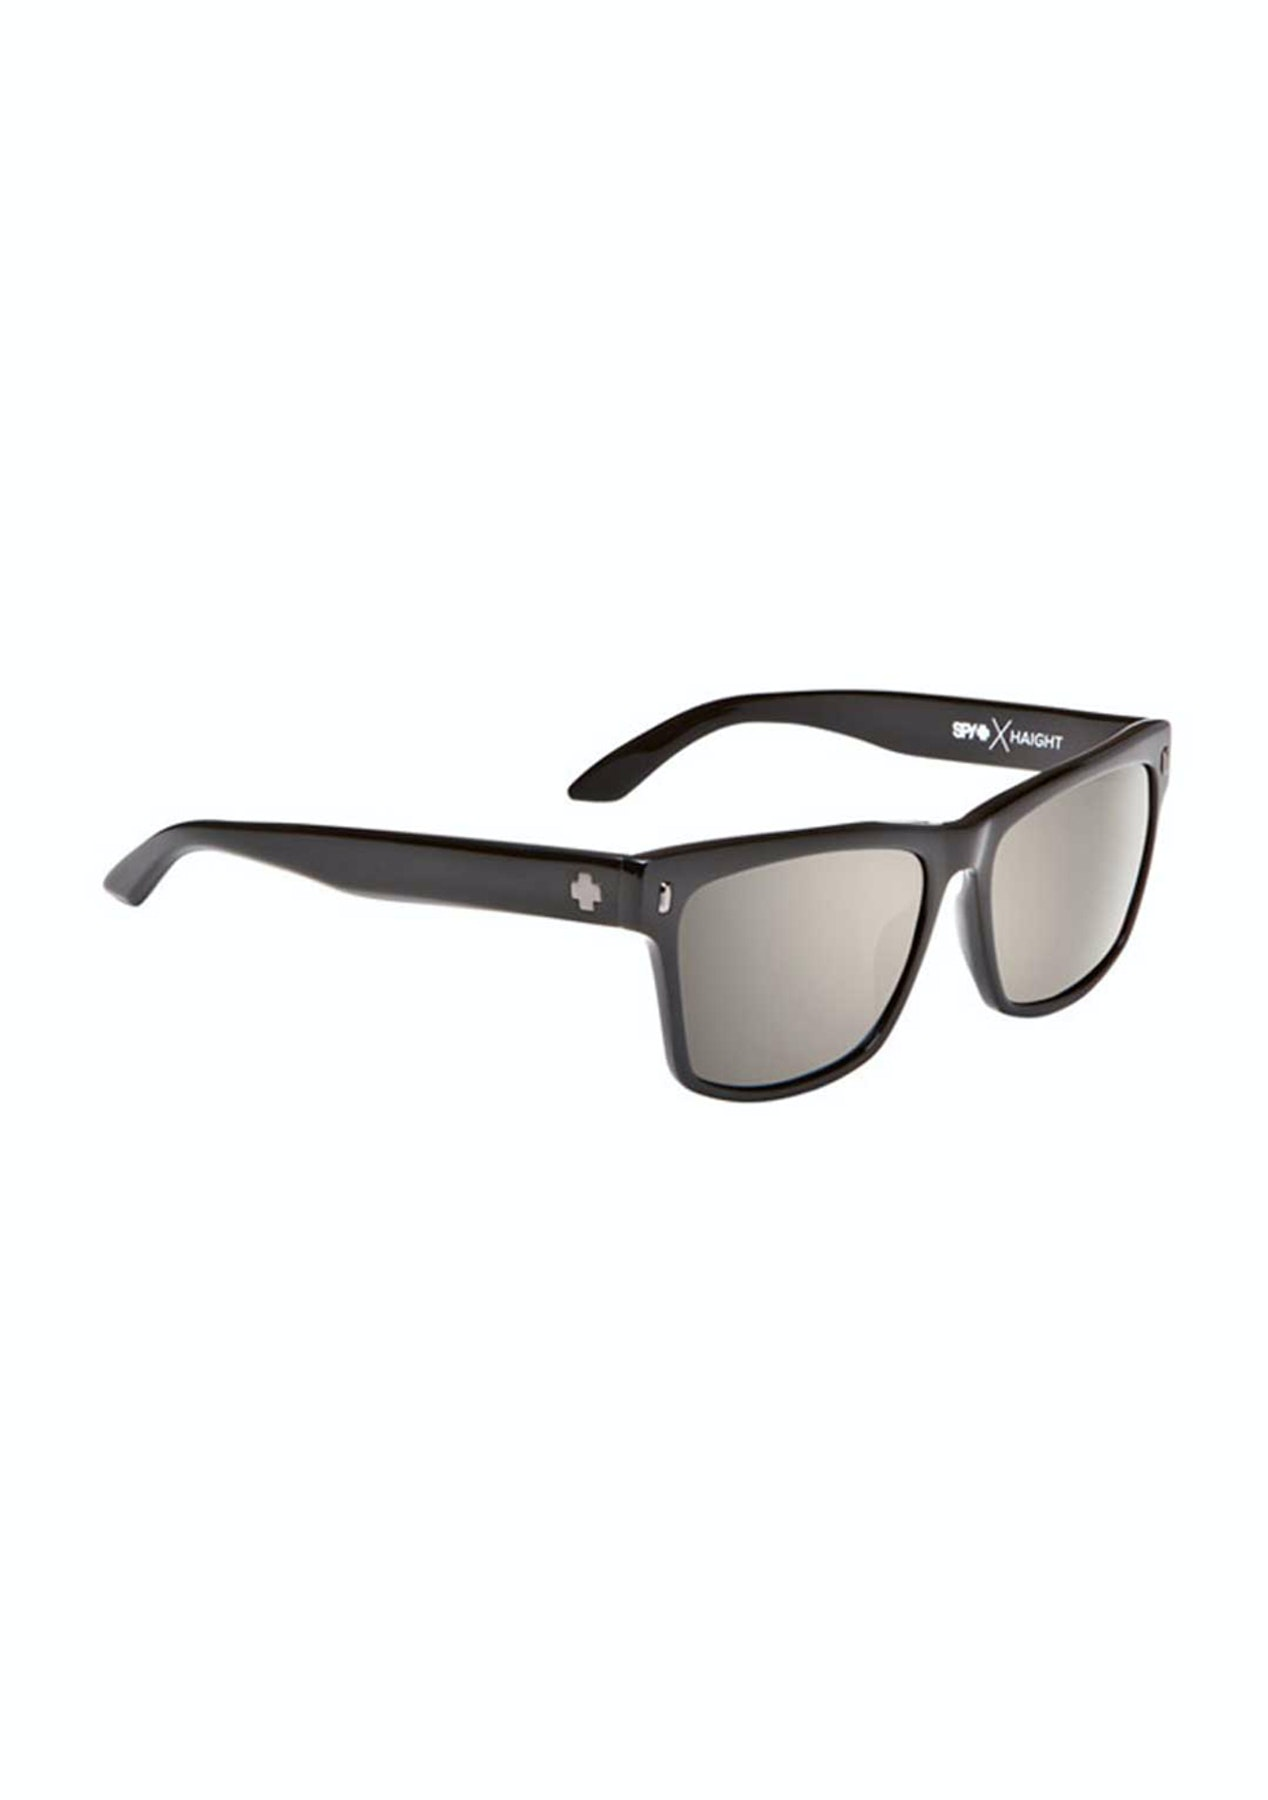 58251efa36 SPY Haight Sunglasses - Black - Happy Bronze Polar w Black Mirror -  Accessories   Eyewear Warehouse - Onceit